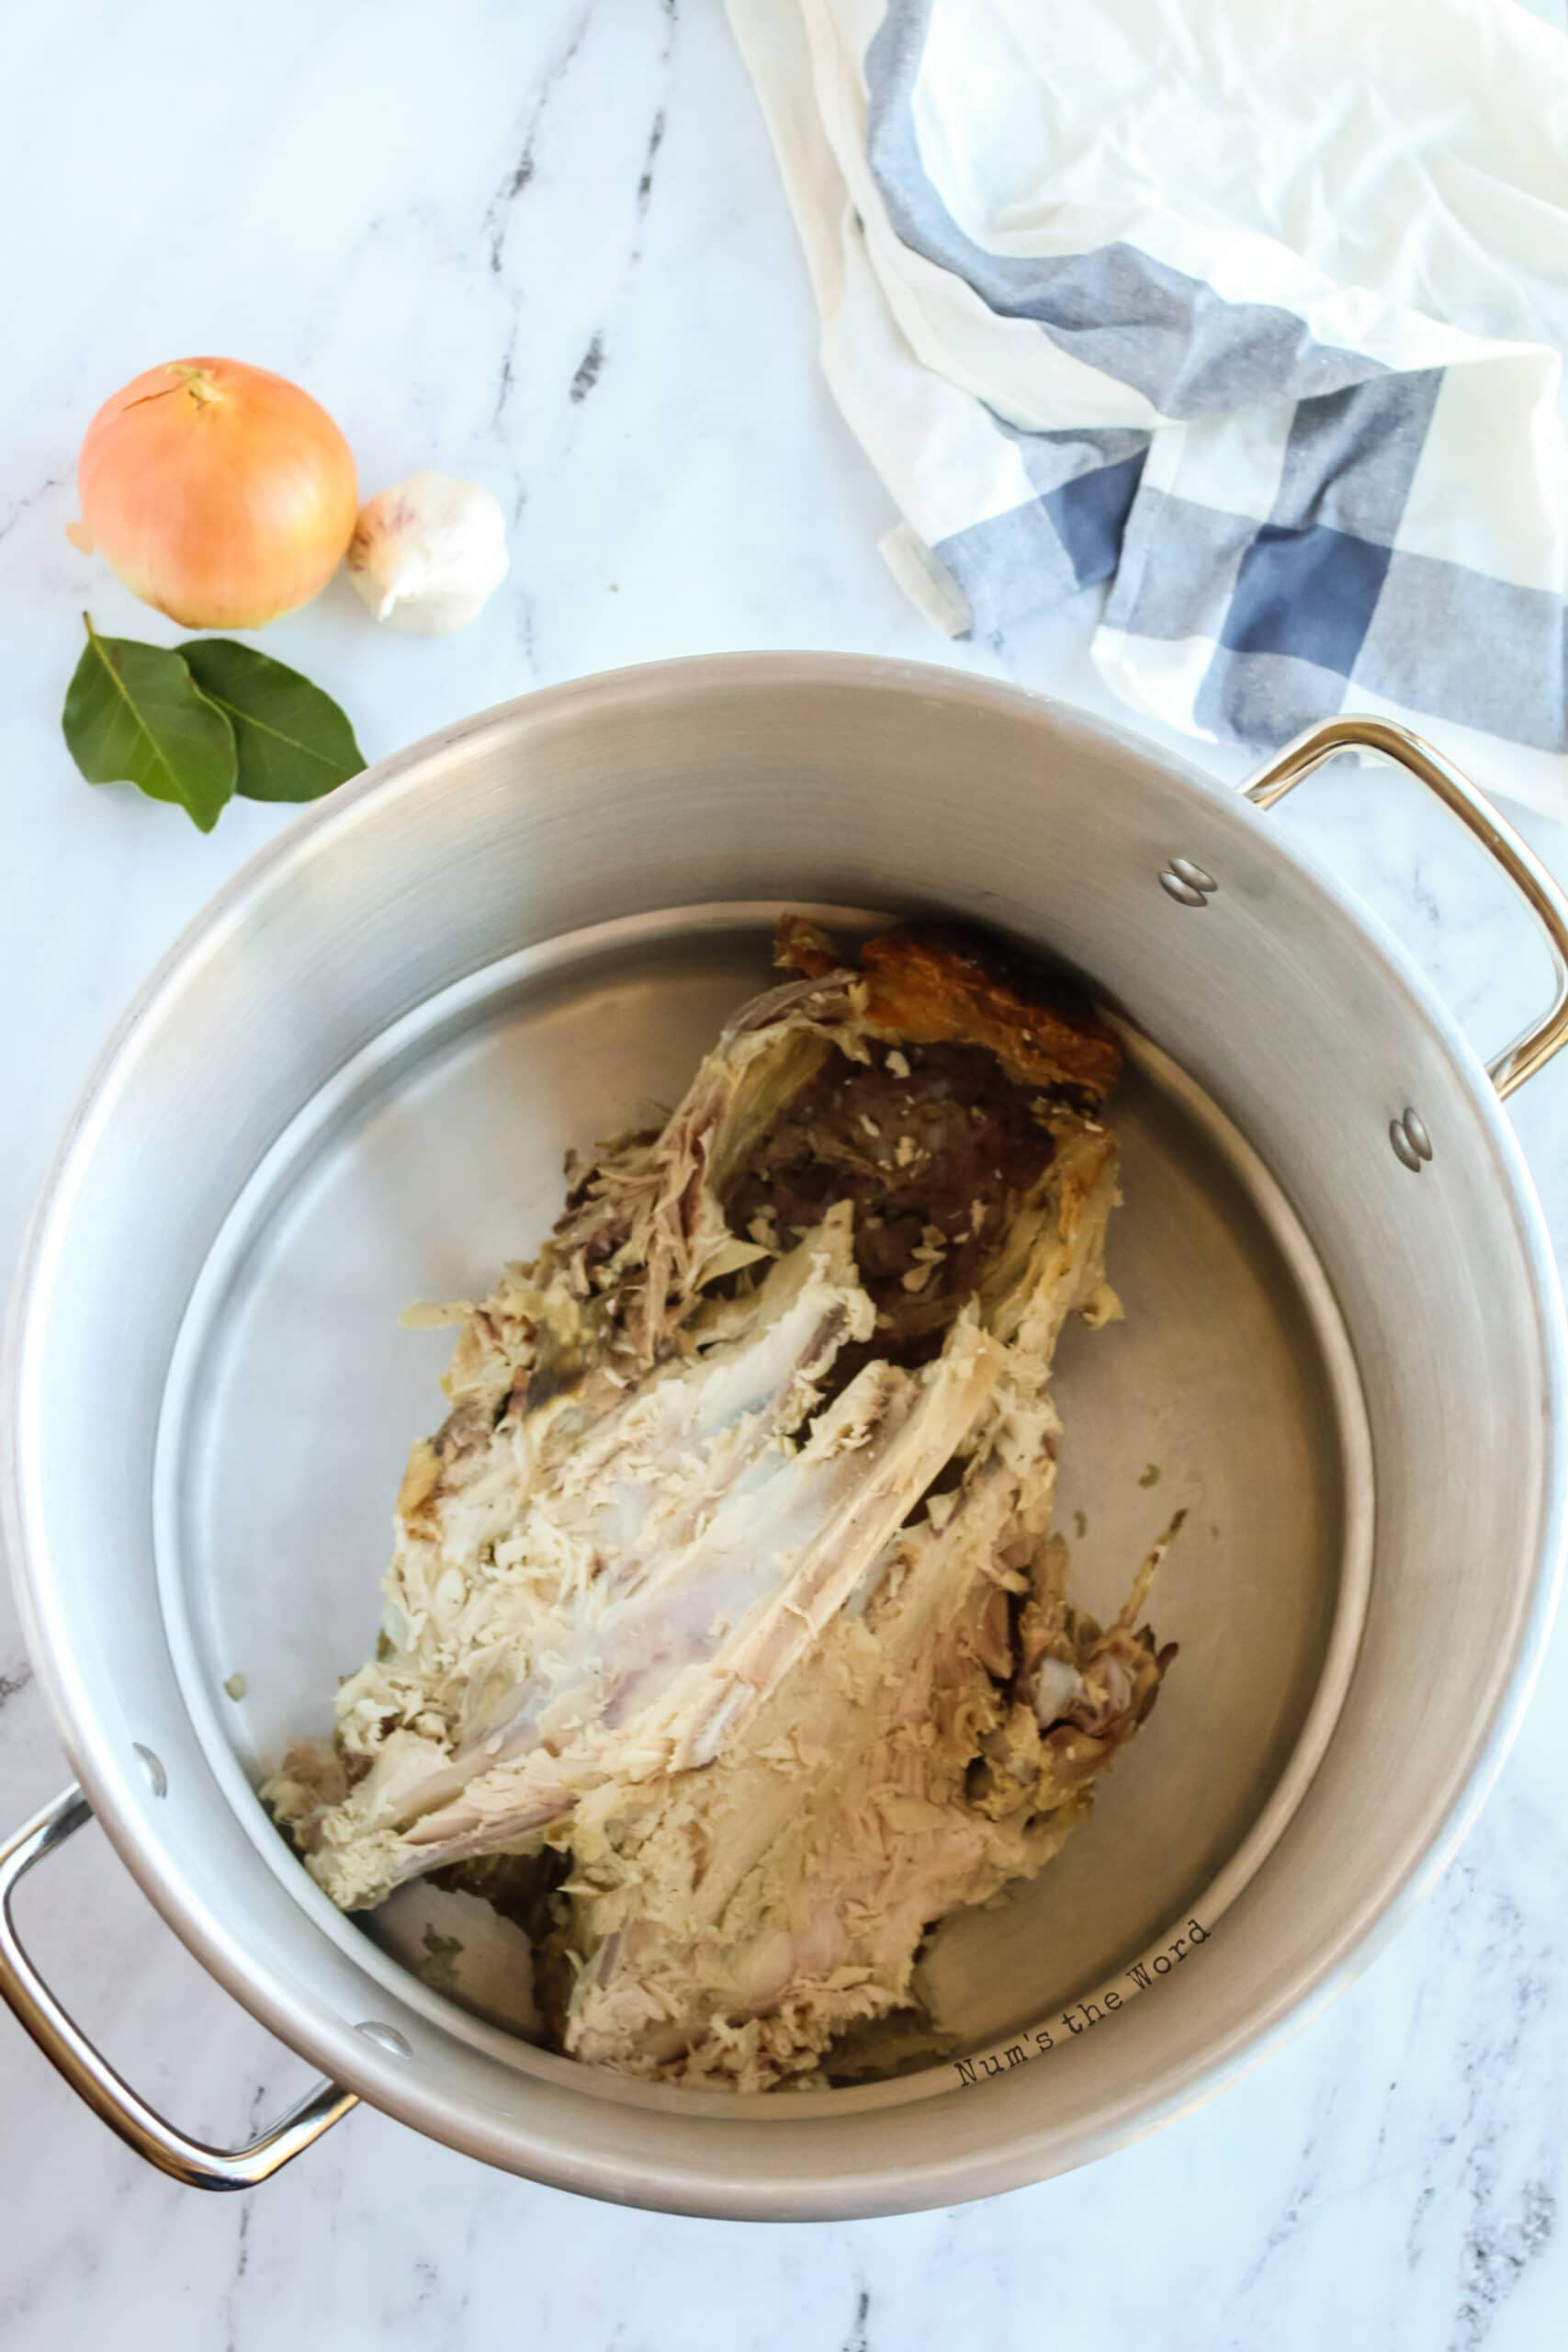 turkey carcass in a large pot